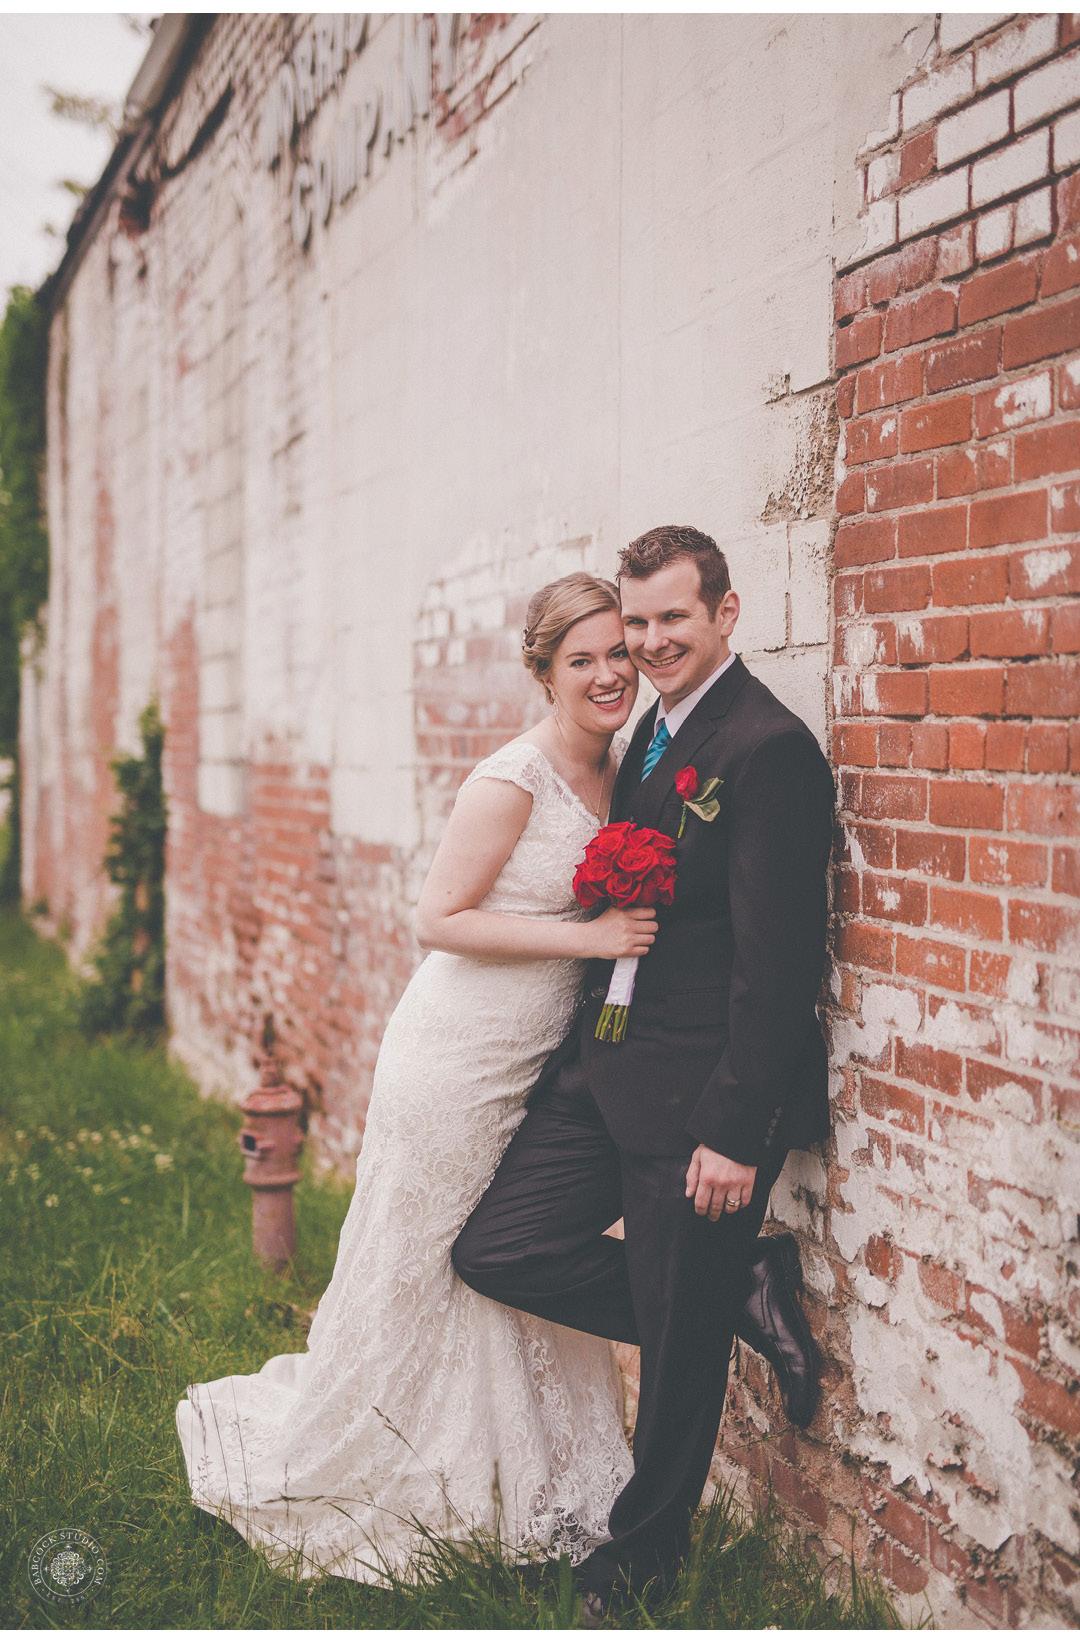 trixie-bryan-wedding-photographer-cedarville-ohio-19.jpg